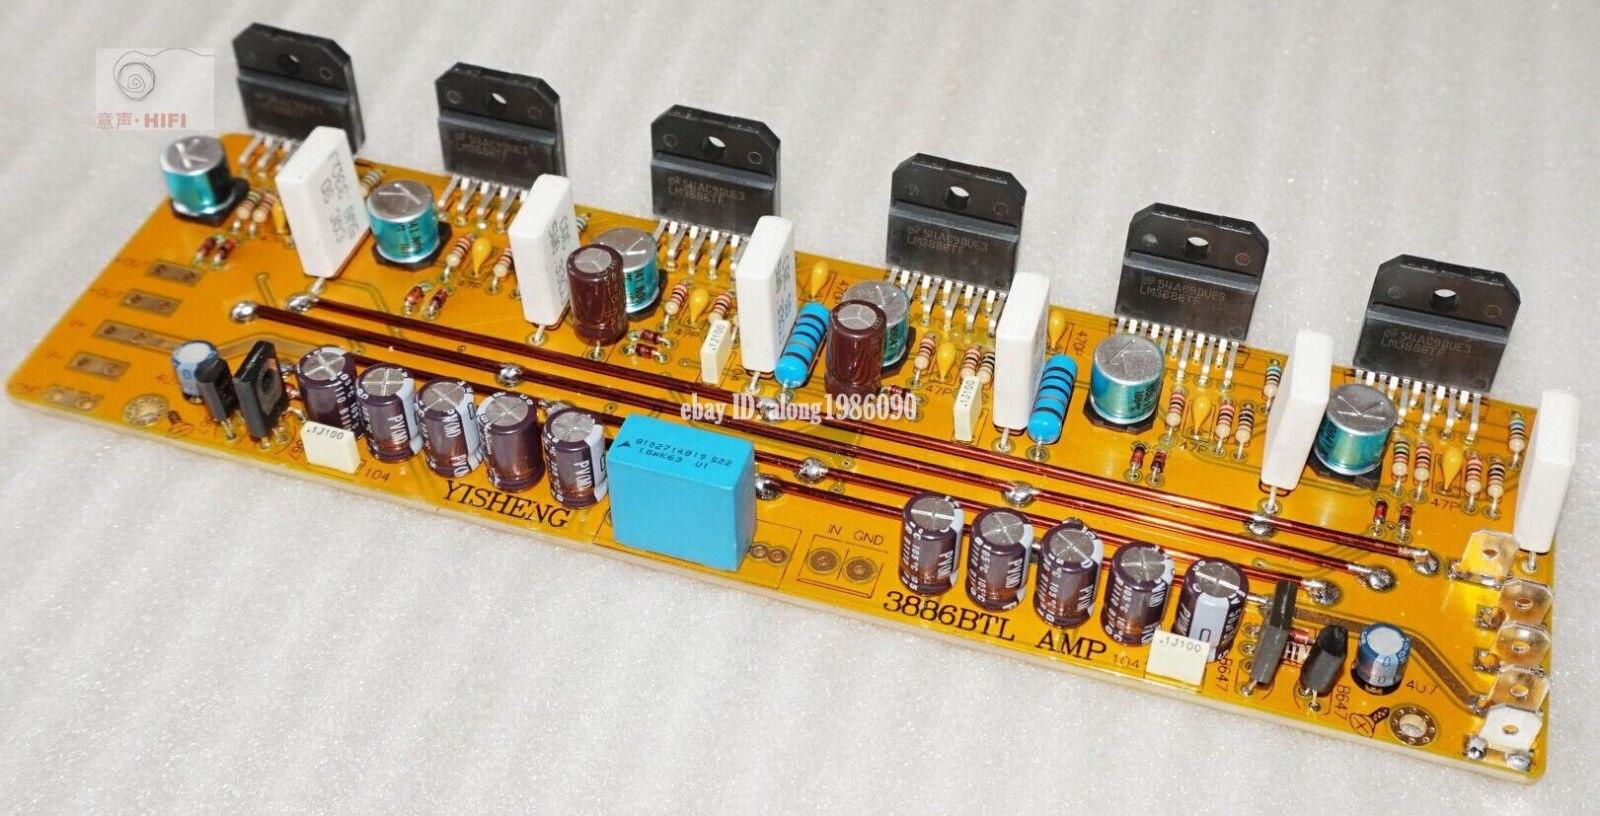 Assembeld Mono LM3886 Hifi Amplifier Board Base On JEFF Rowland LM3886 Power Amplifier sep store update version new 140 amplifier board psu board base on naim nap140